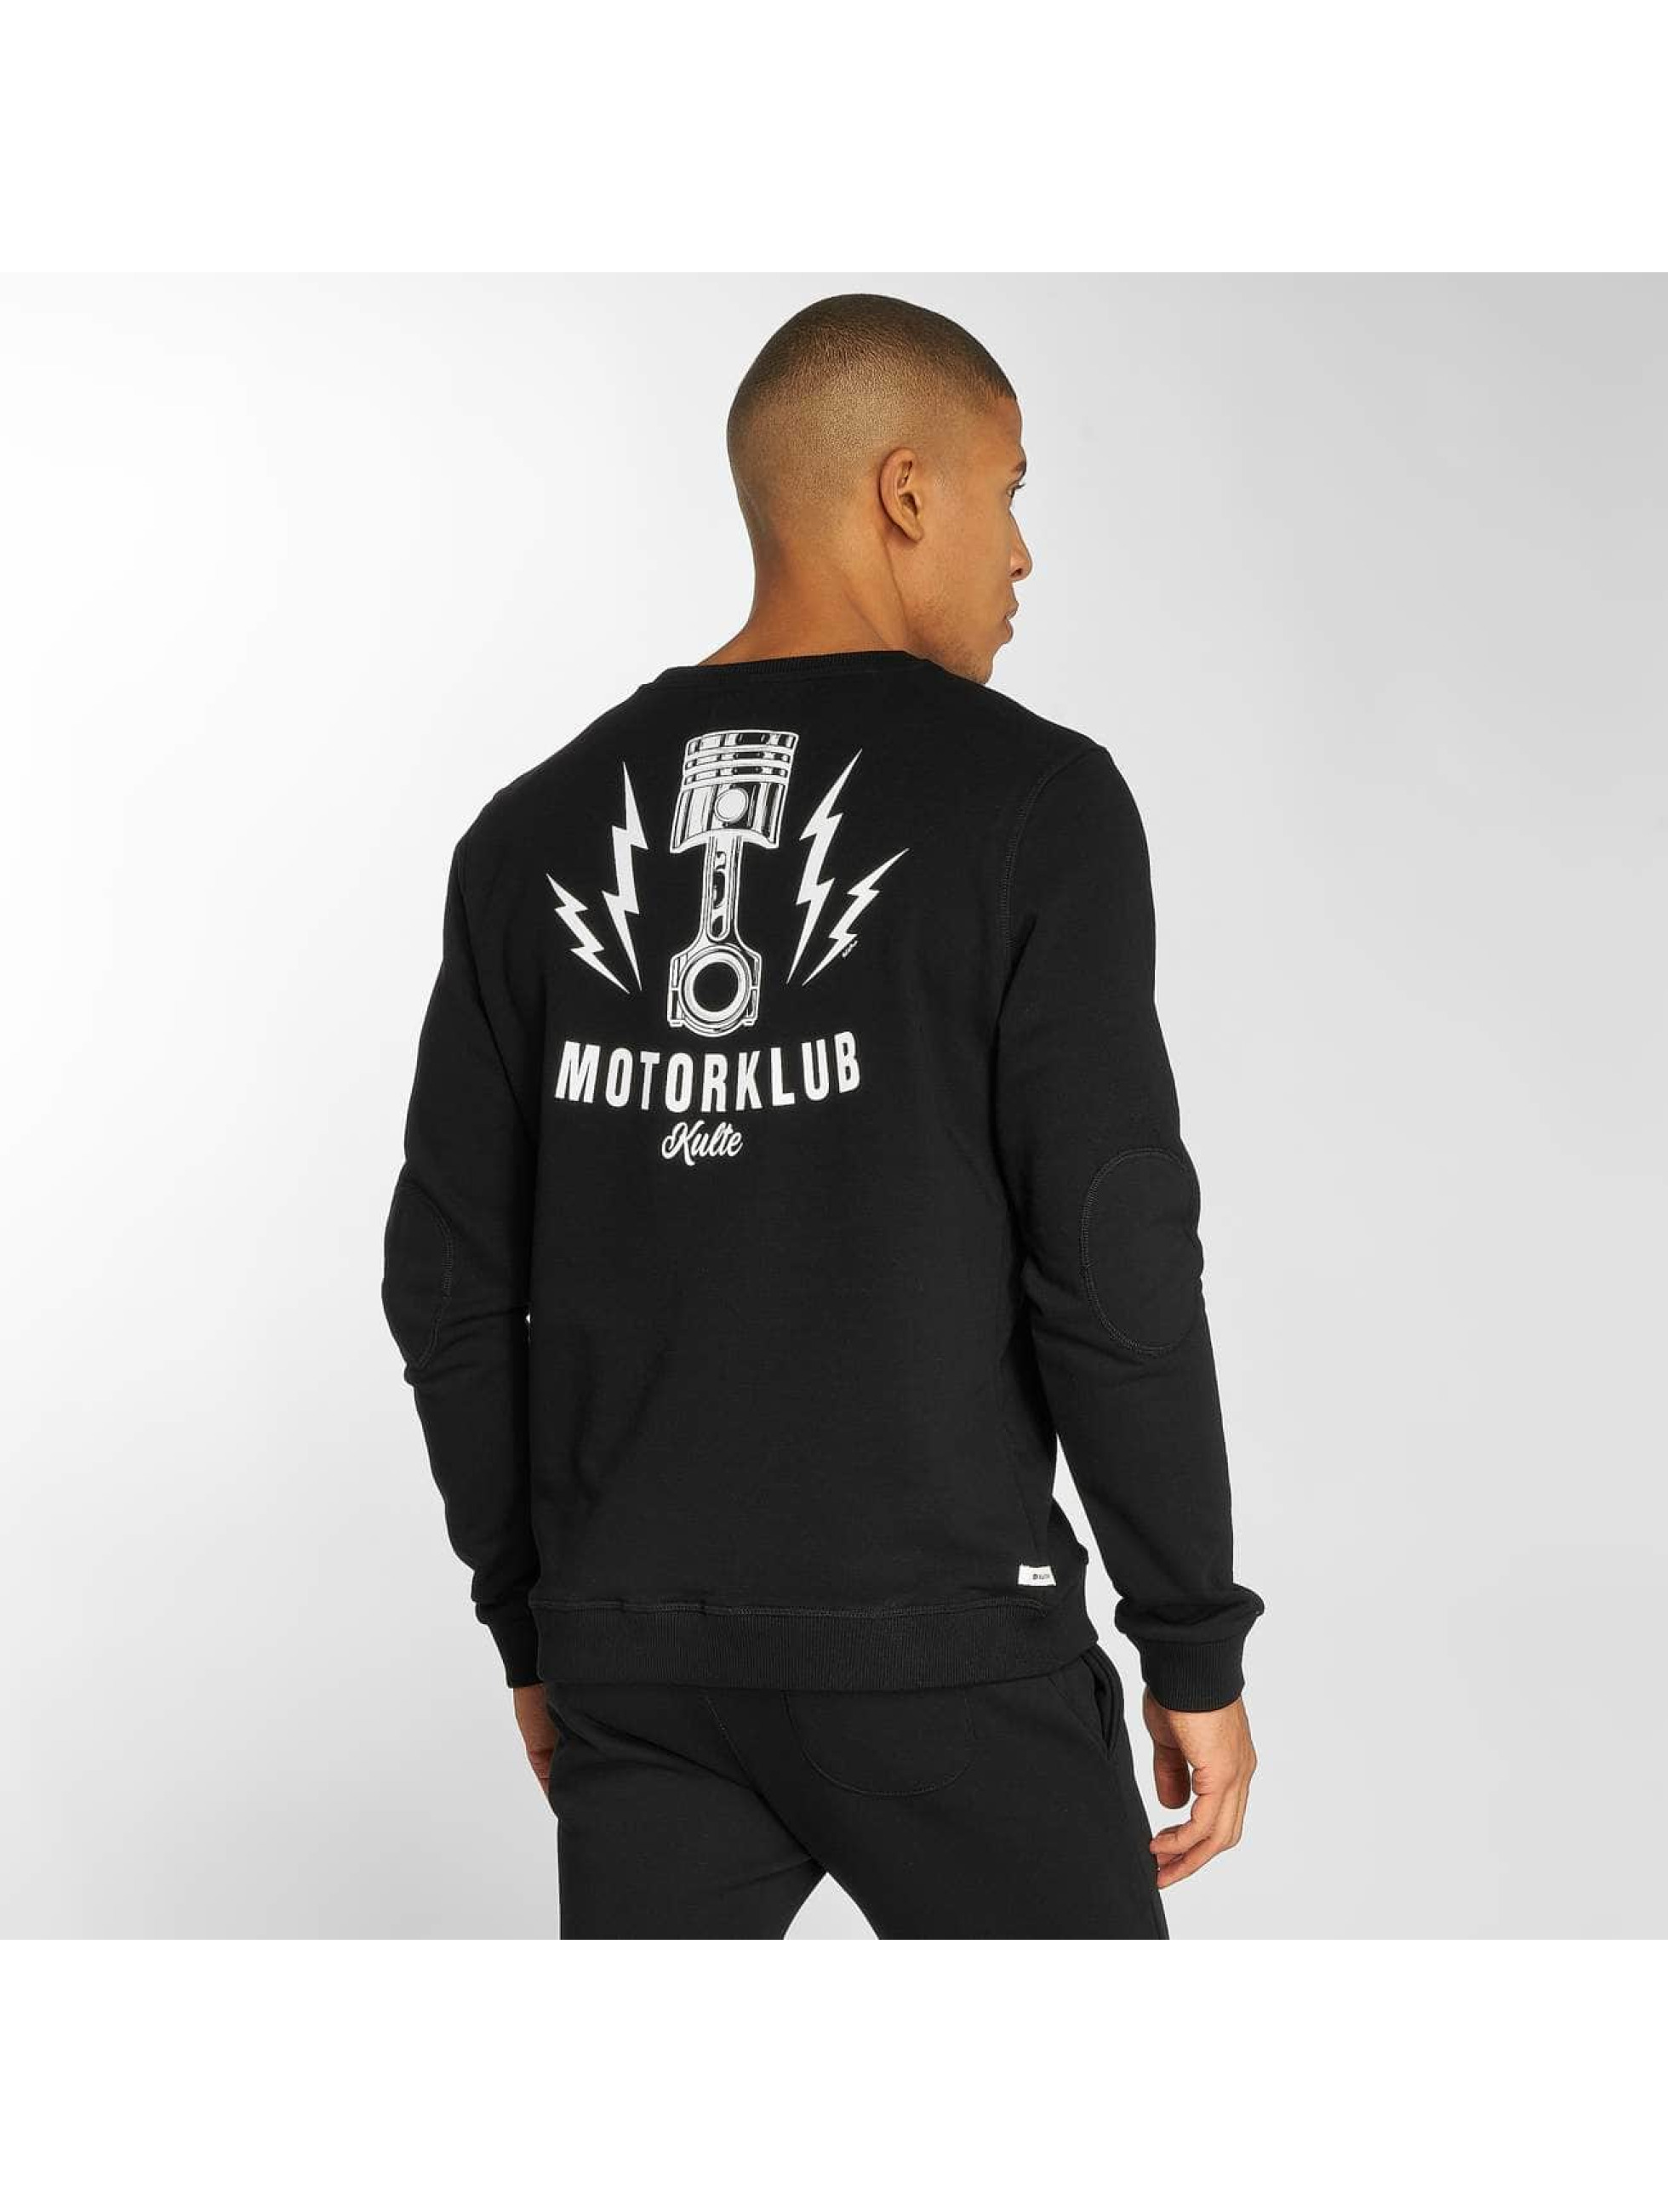 Kulte Swetry Motorklub czarny